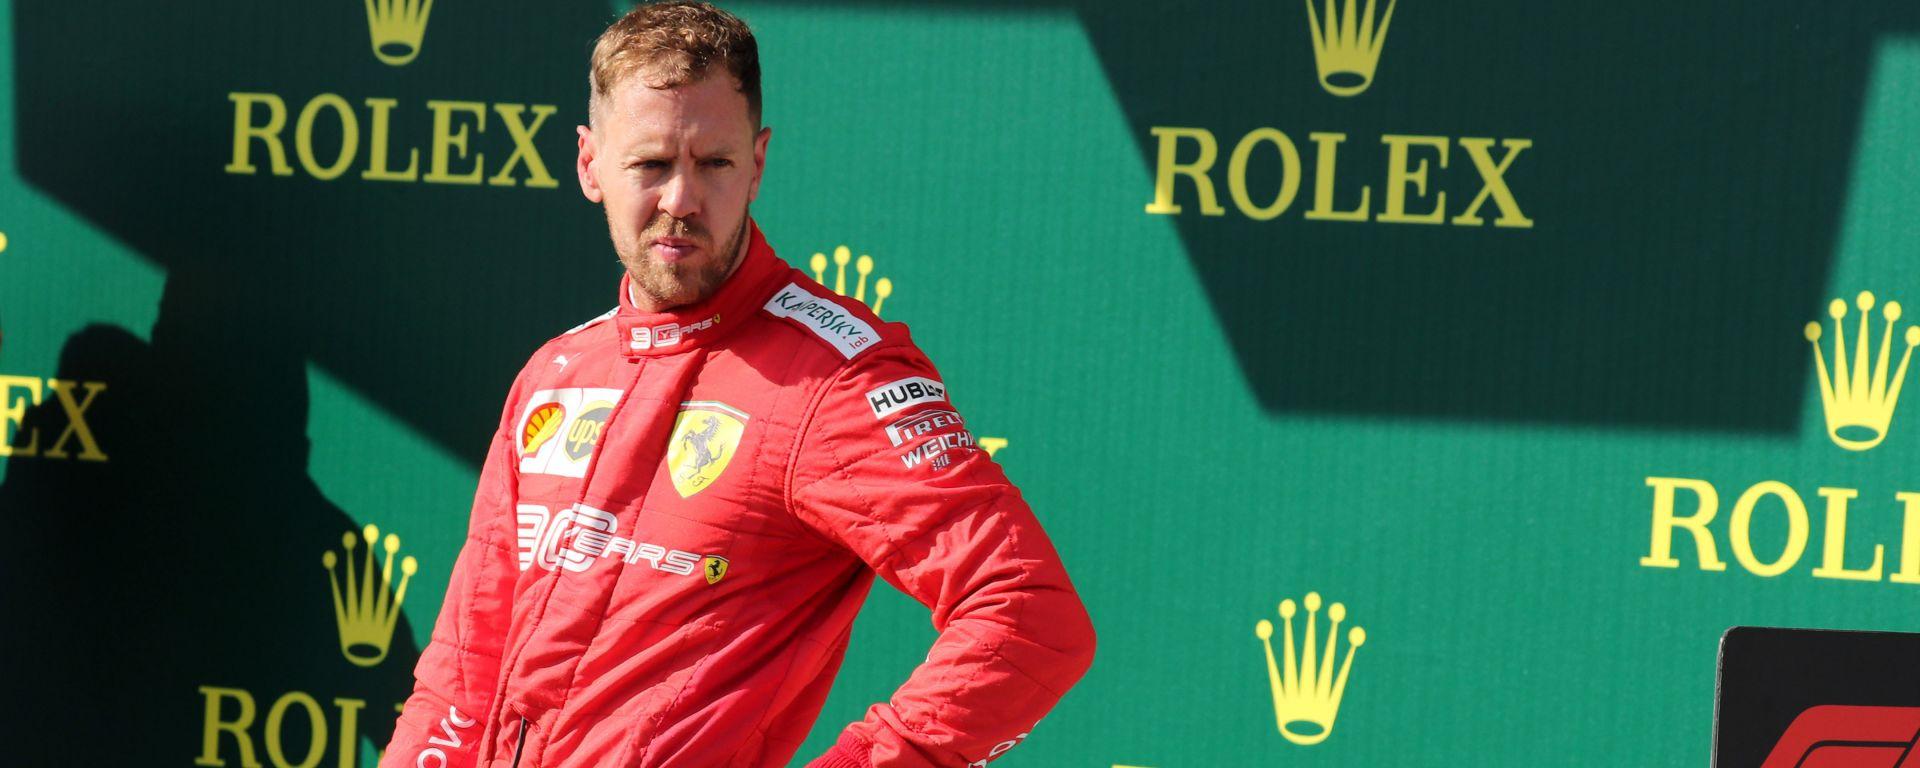 F1 GP Ungheria 2019, Budapest: Vettel (Ferrari) osserva pensieroso la Mercedes di Hamilton